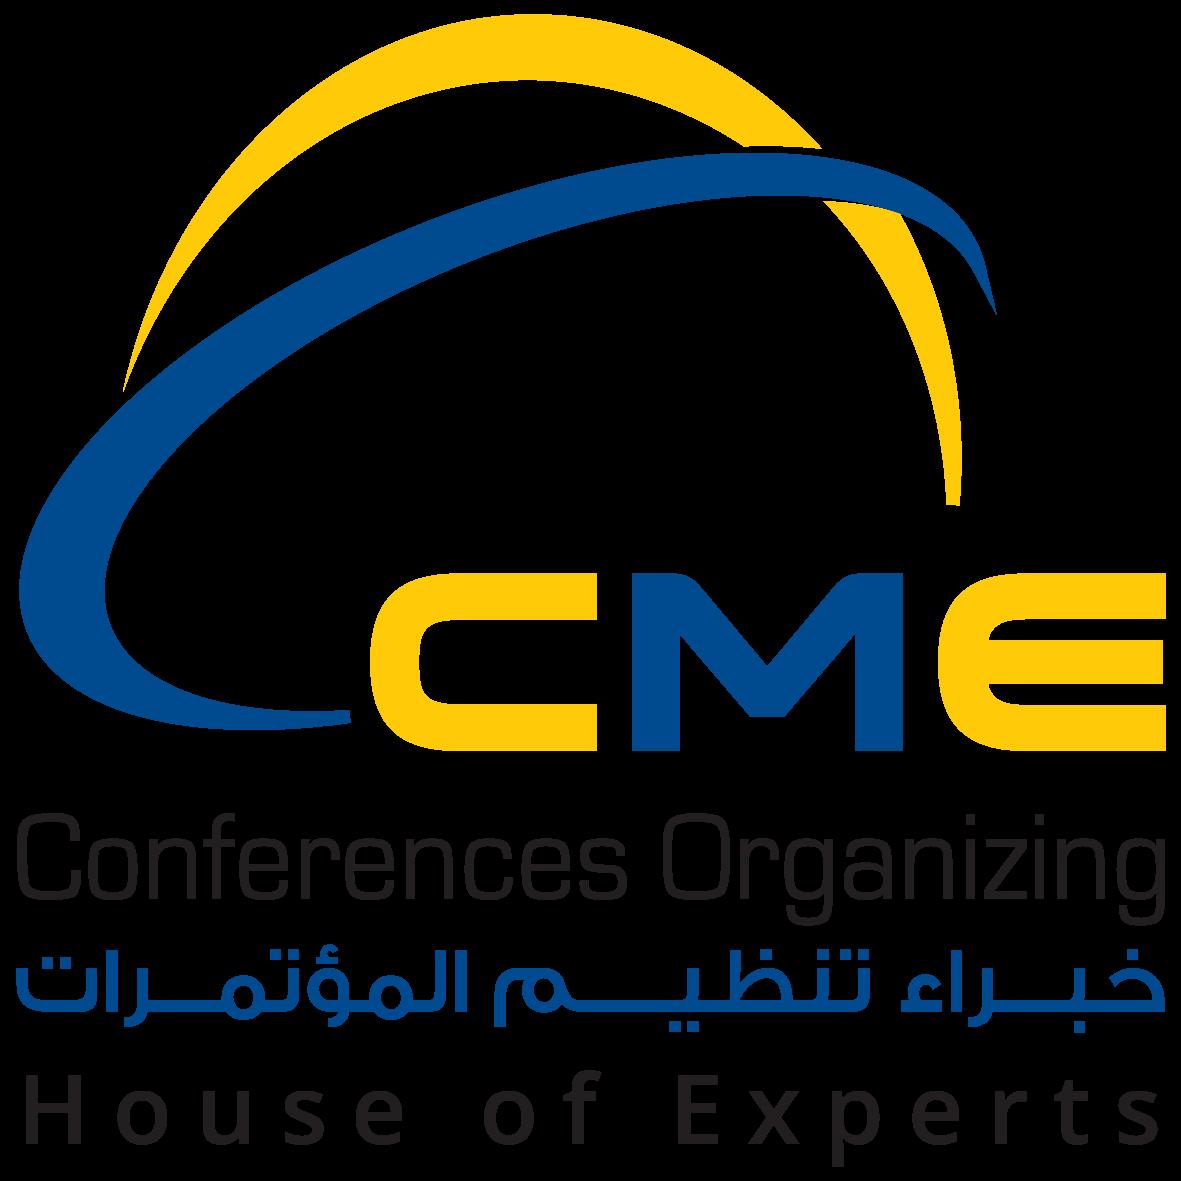 Dubai CME